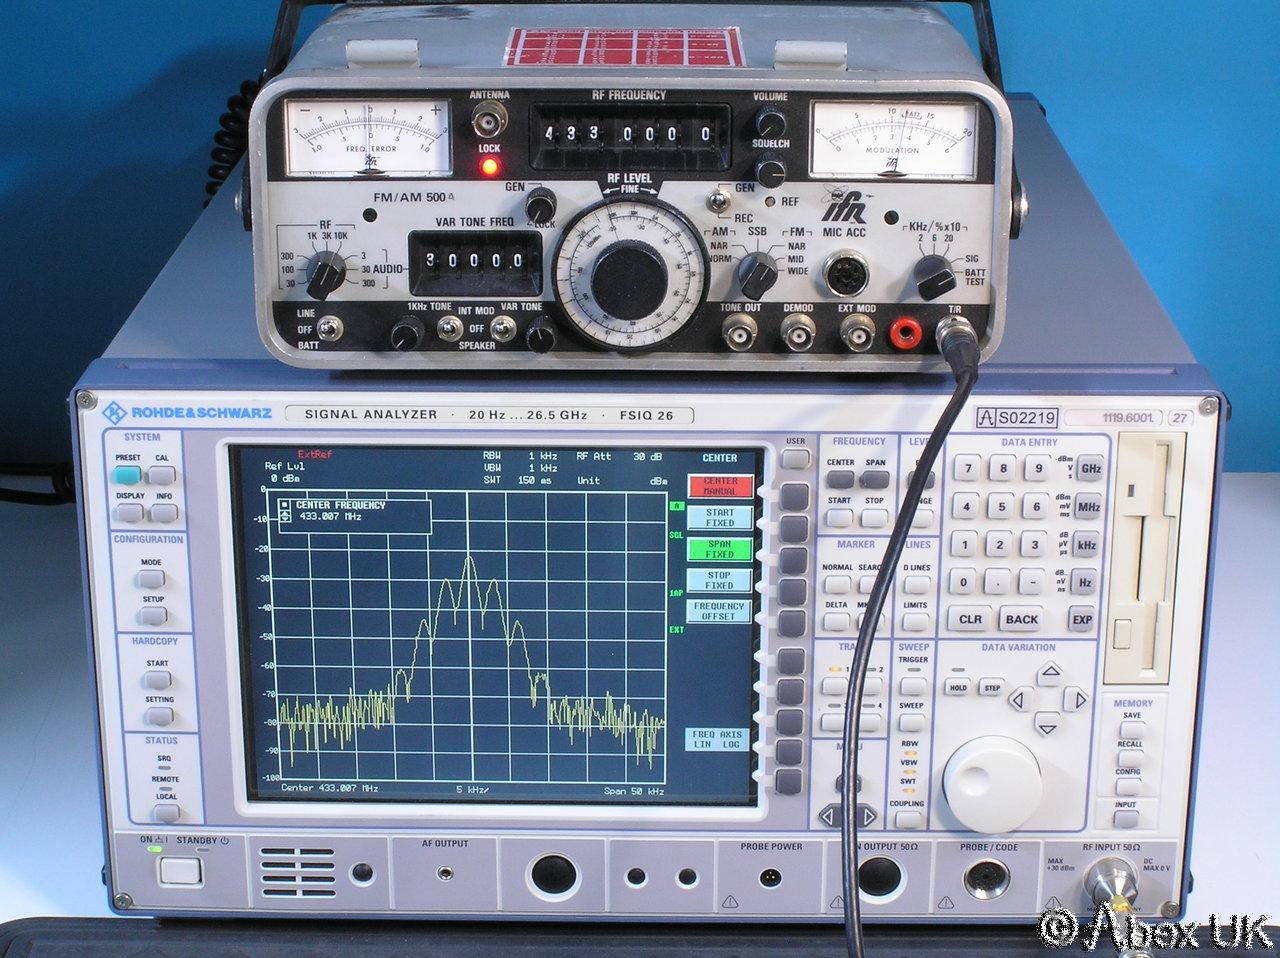 IFR (Aeroflex) 500A Radio Test Set, Portable